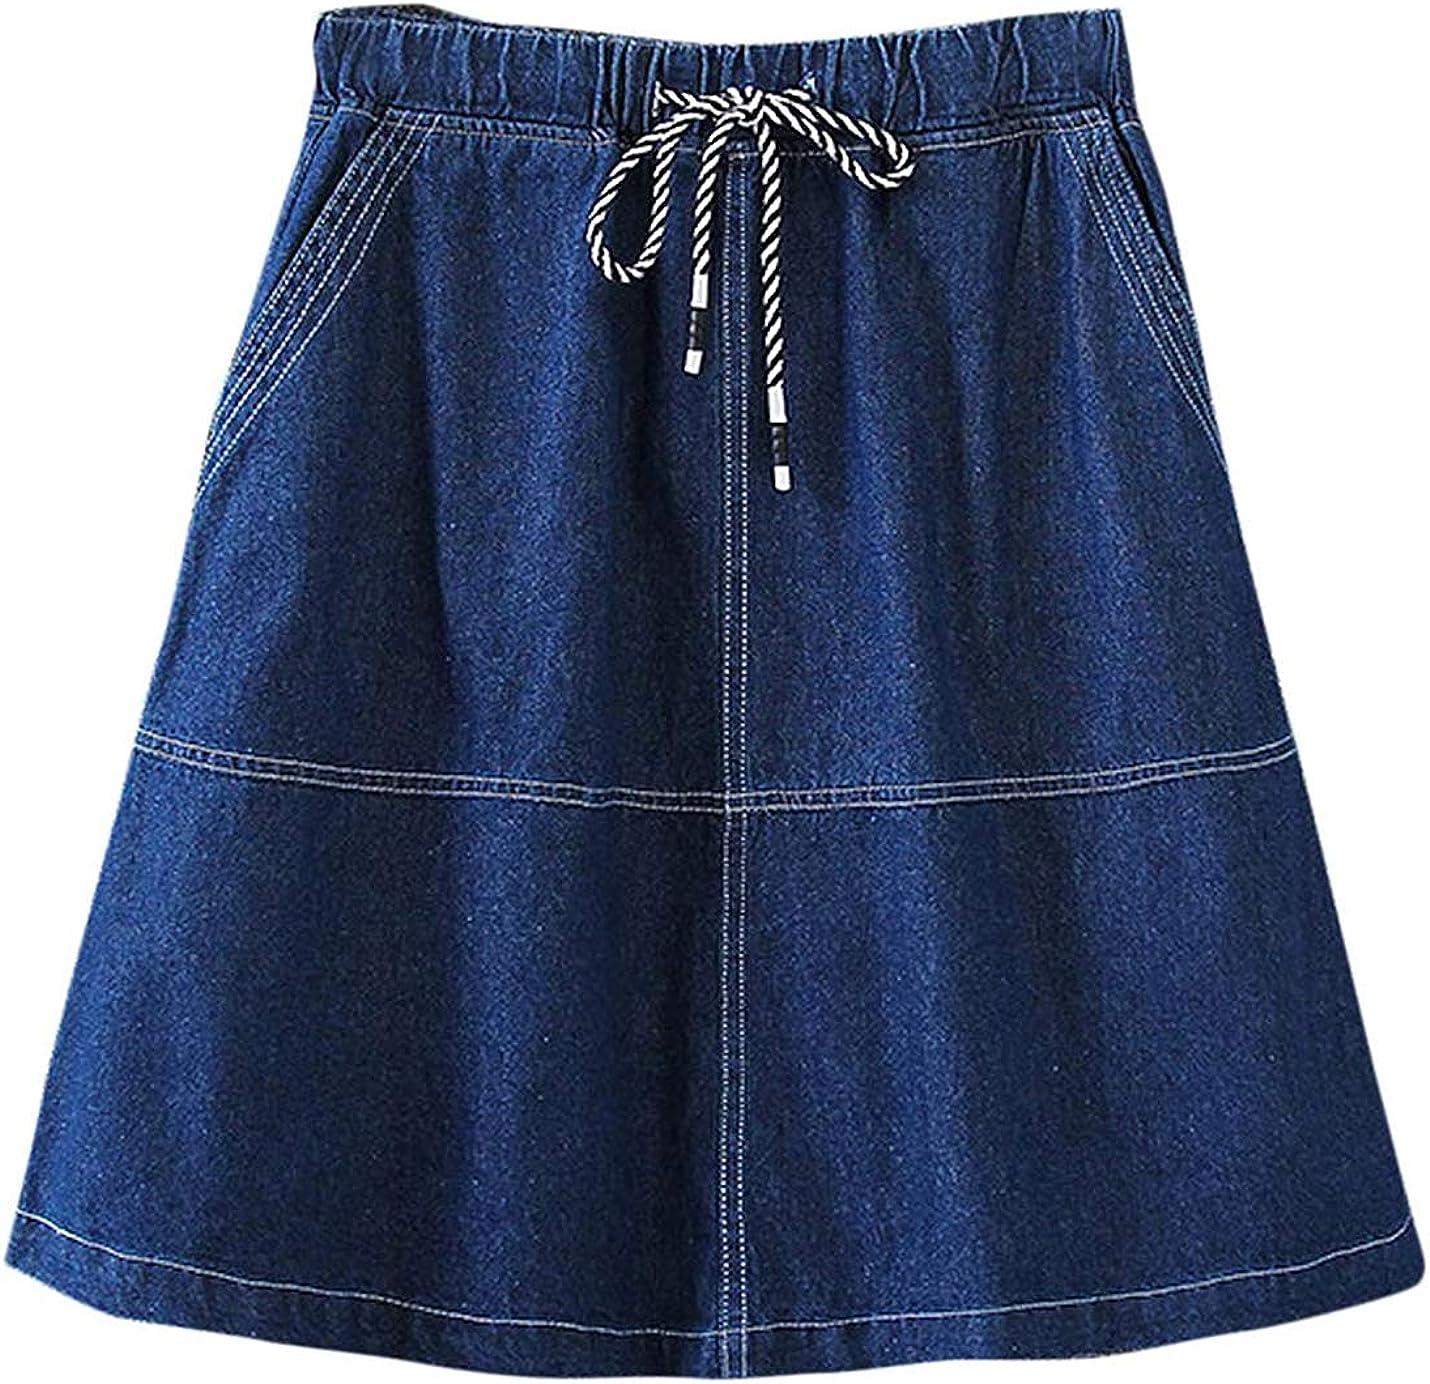 PAODIKUAI Women's Casual Drawstring Elastic Waist A-Line Denim Mini Skirt